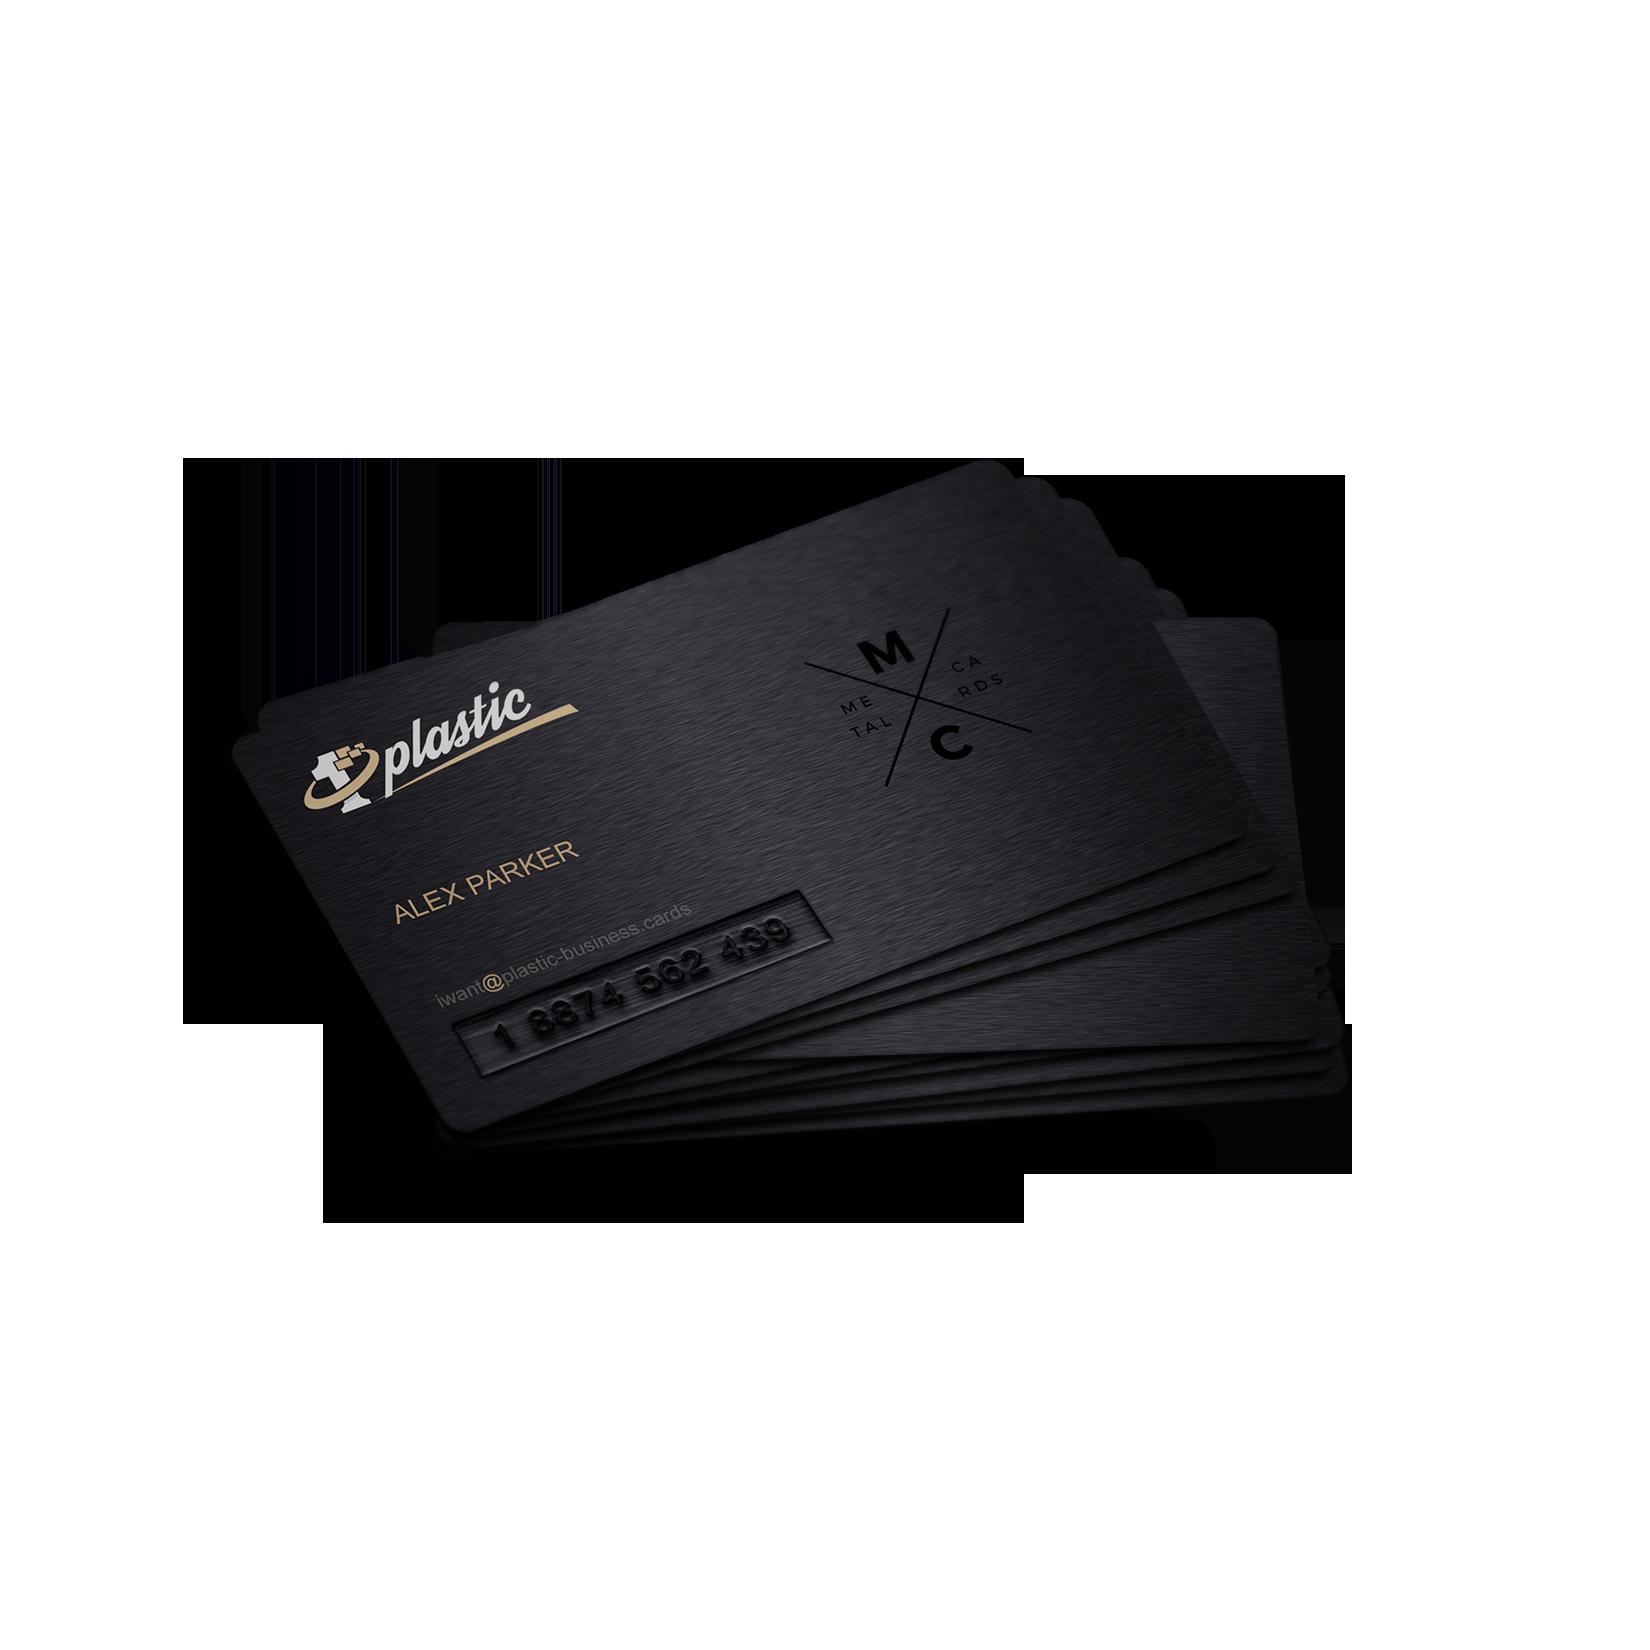 metal business card 2 000 pcs black steel free shipping worldwide expand the mind awaken. Black Bedroom Furniture Sets. Home Design Ideas